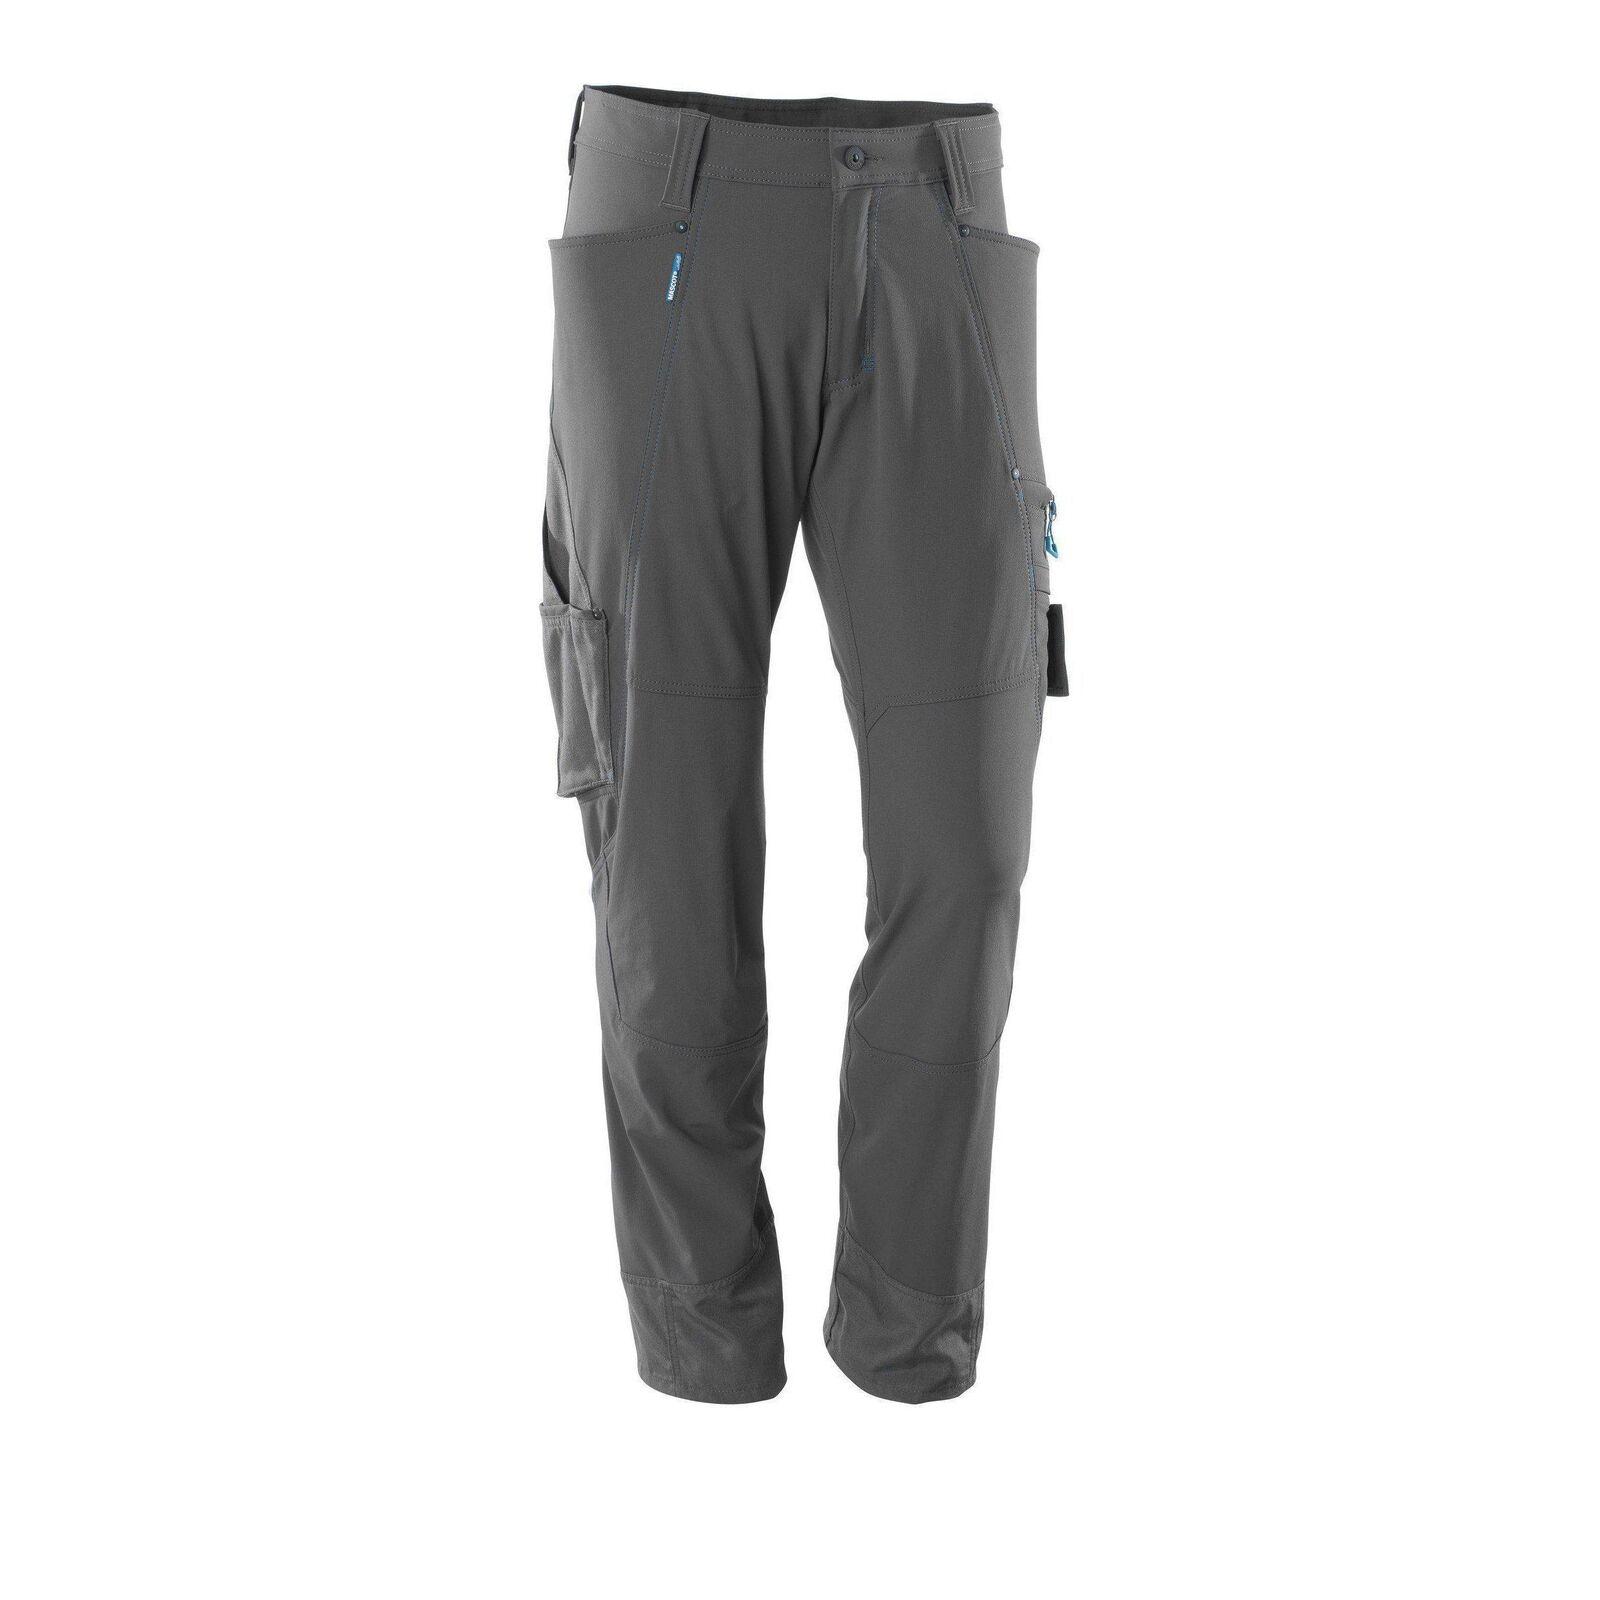 MASCOT Workwear ADVANCED Lightweight Work Pants 17279-311